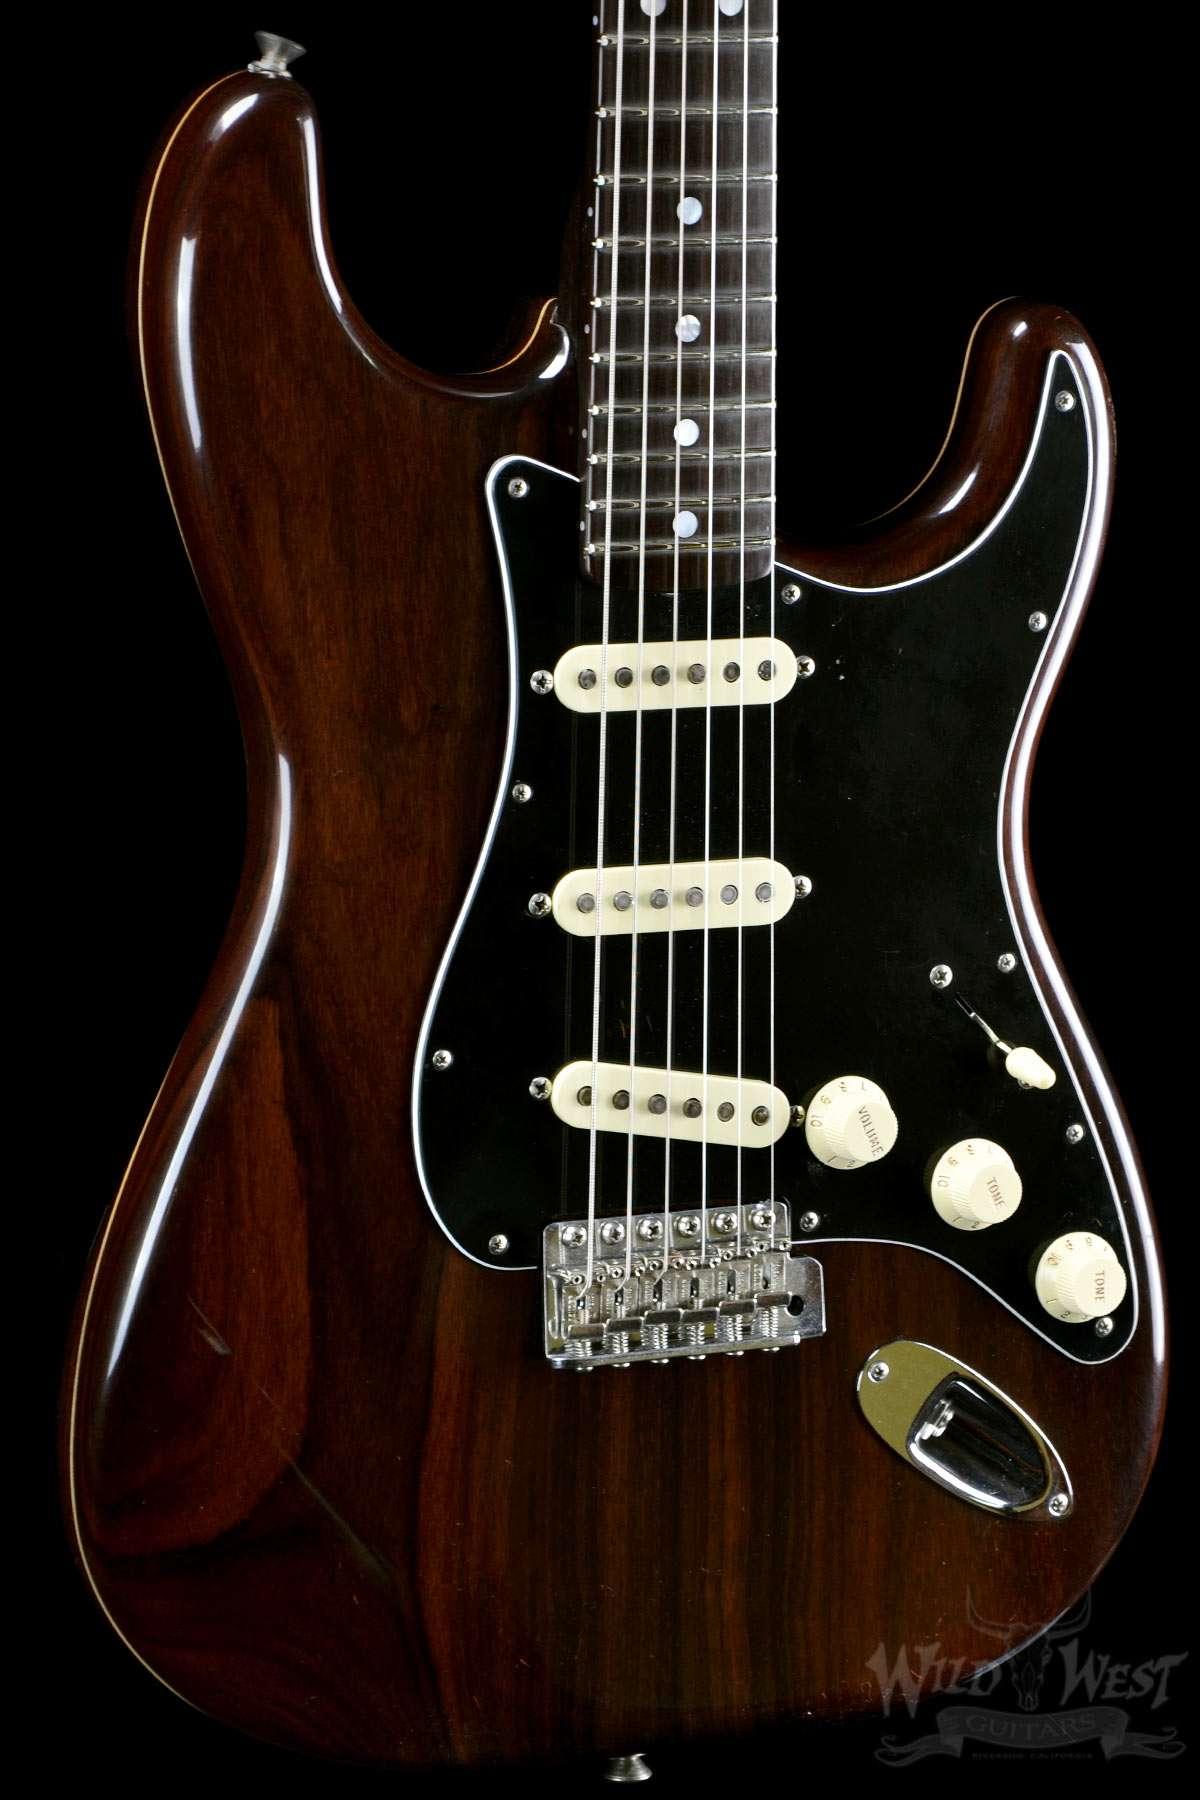 fender custom shop 1960 s closet classic rosewood stratocaster wild west guitars. Black Bedroom Furniture Sets. Home Design Ideas